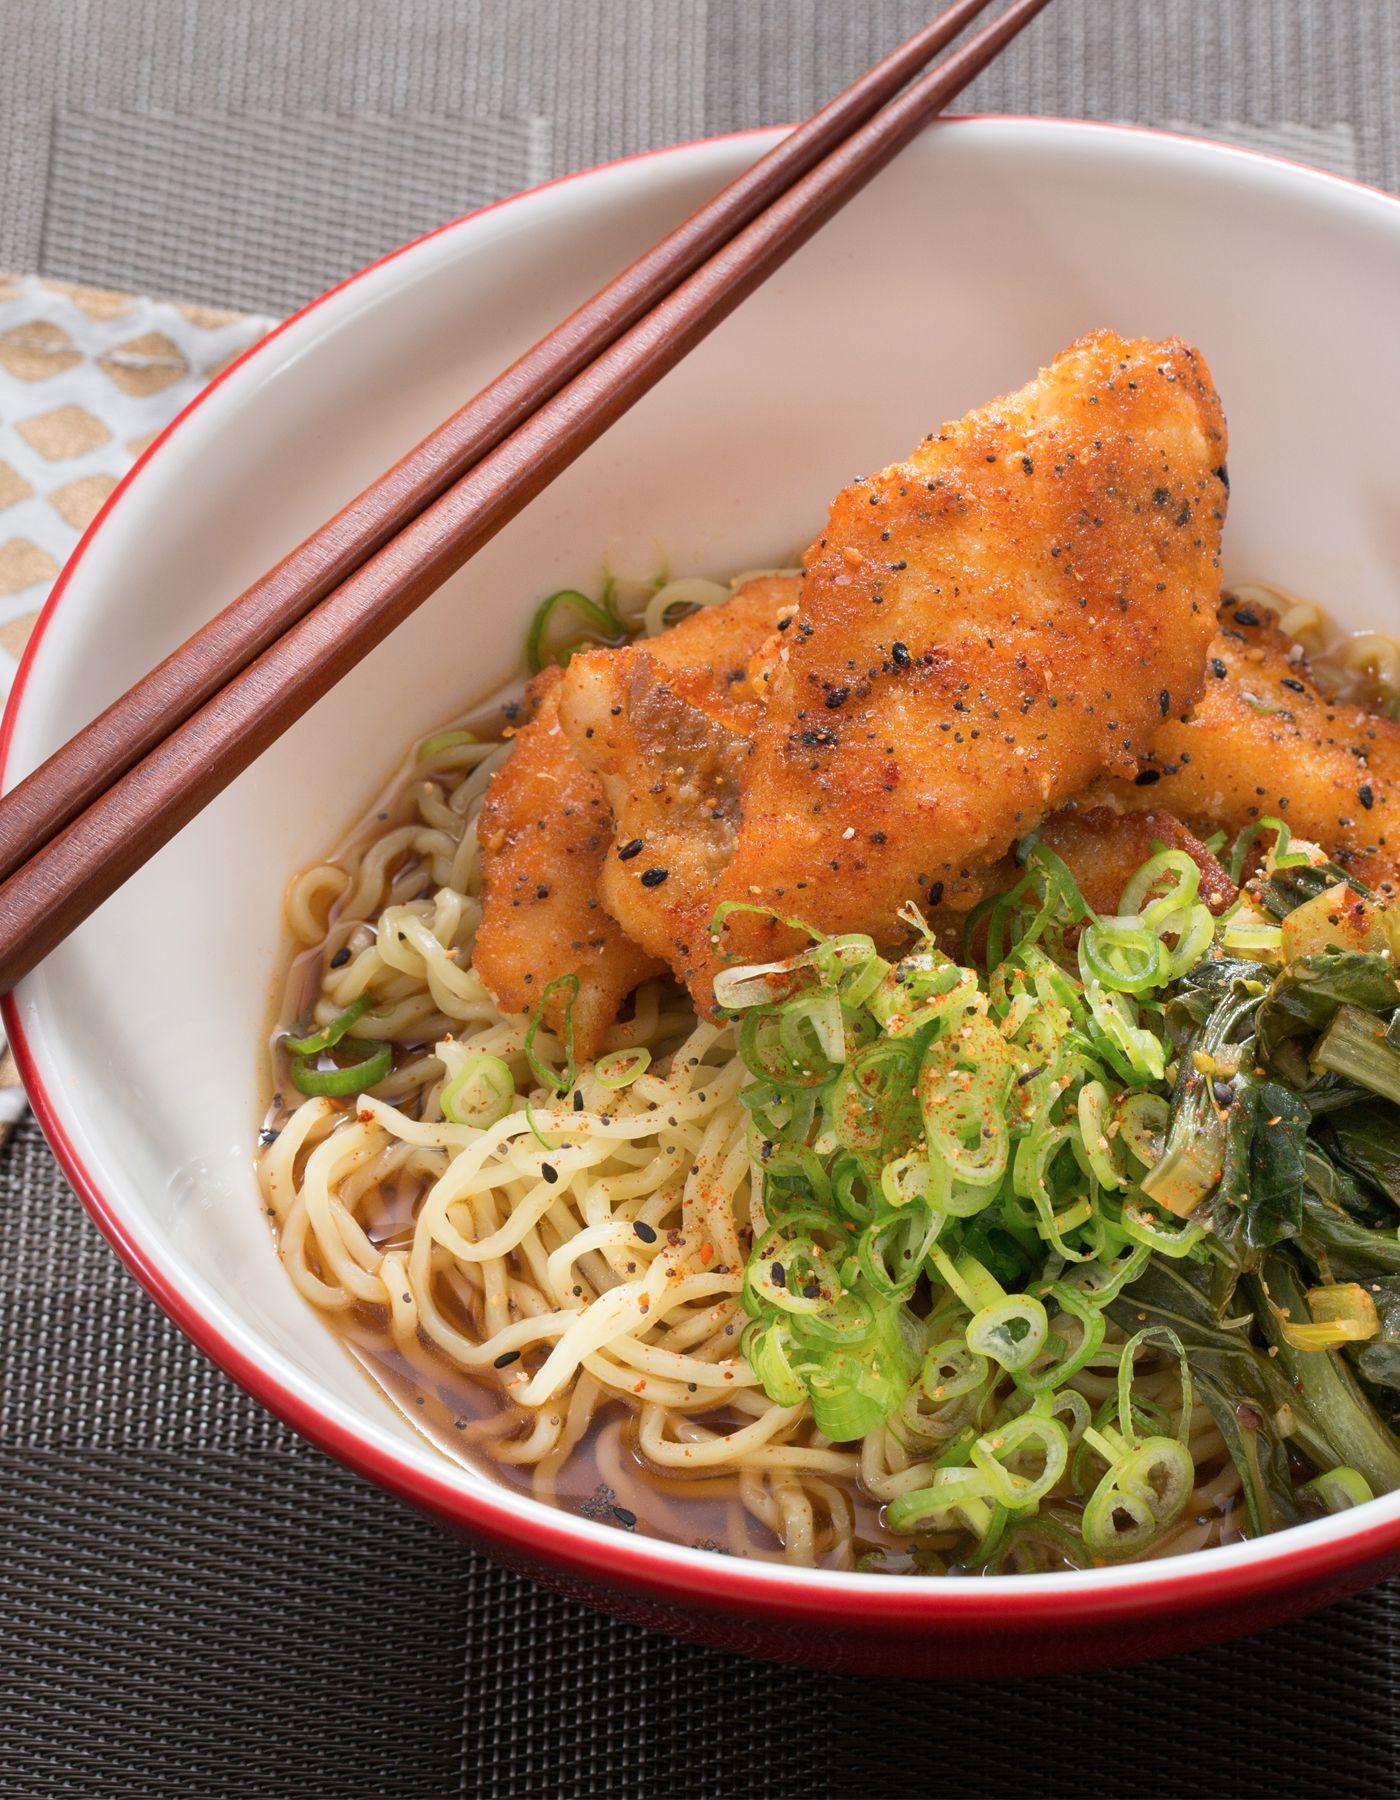 Blue apron yuzu kosho - Crispy Catfish Shoyu Ramen With Yu Choy Fresh Ramen Noodles